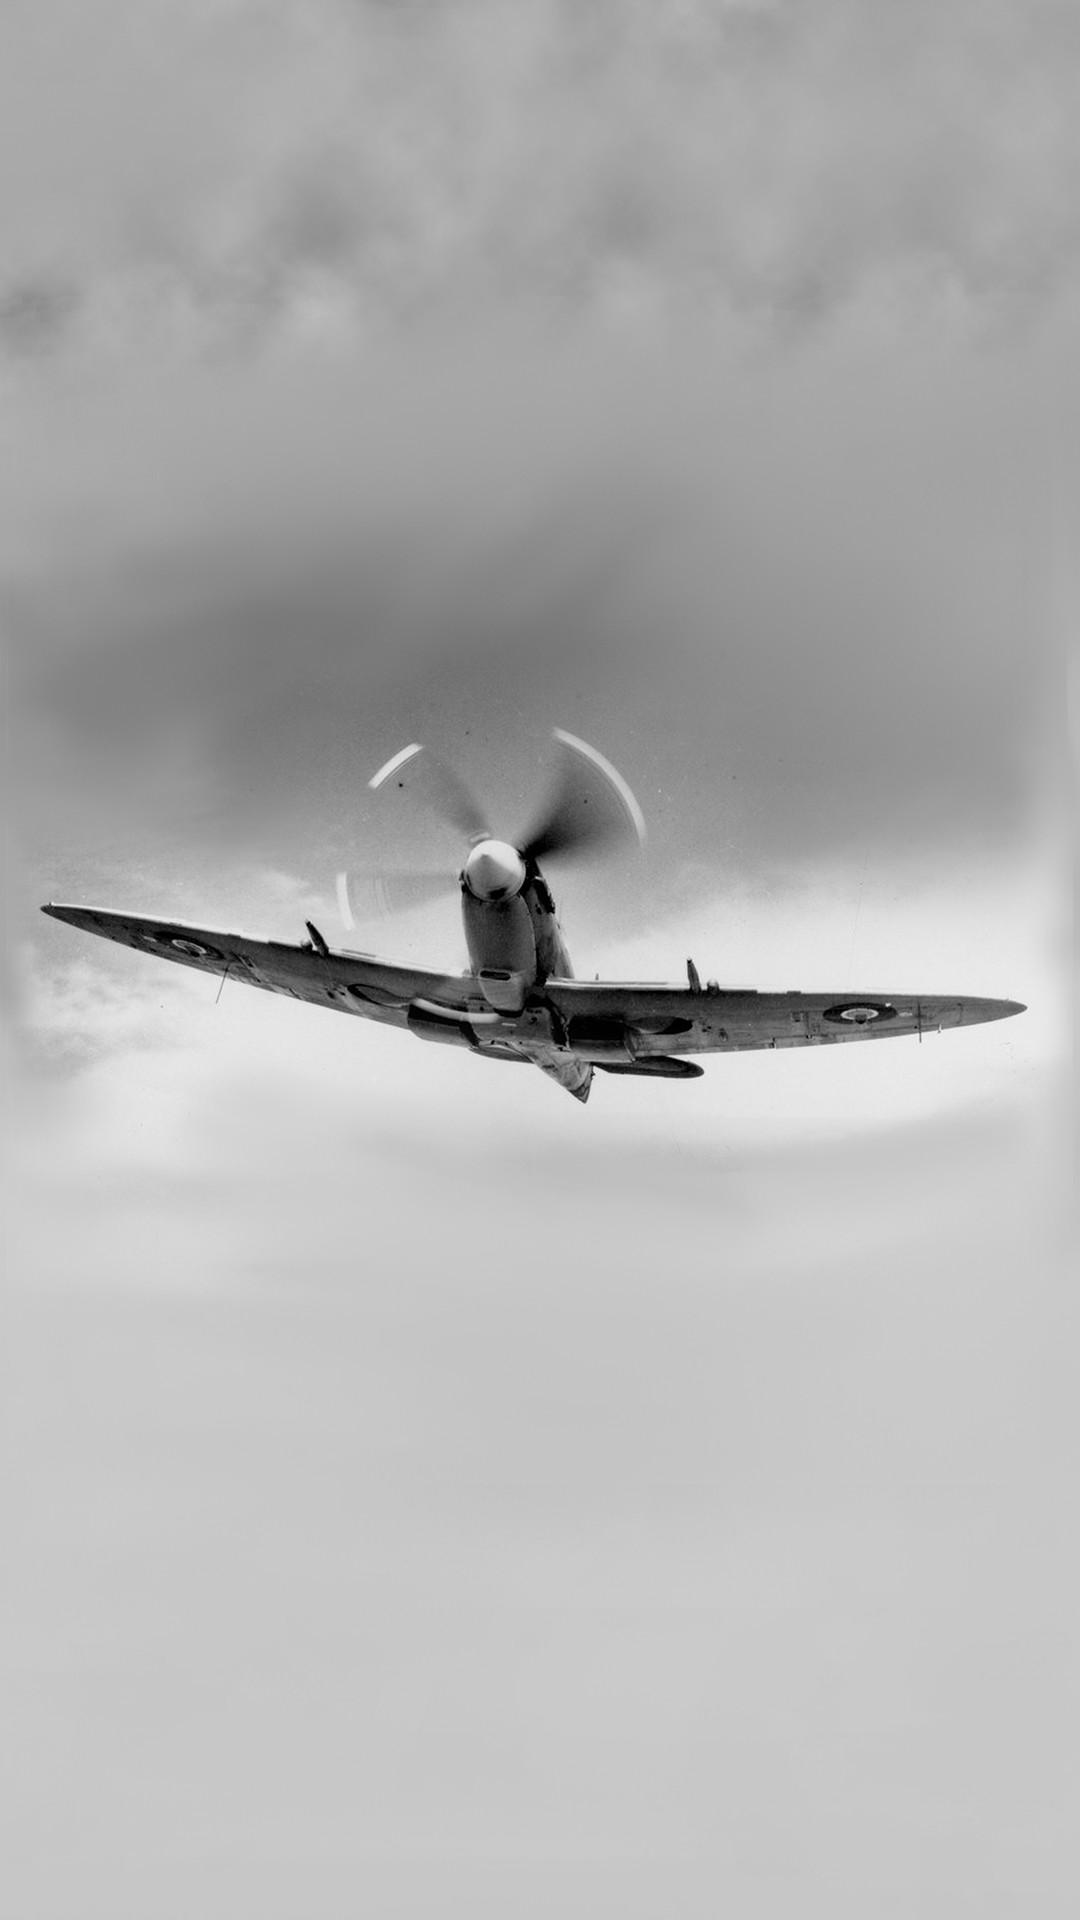 Supermarine Spitfire Smartphone Wallpapers Wallpaper Cave